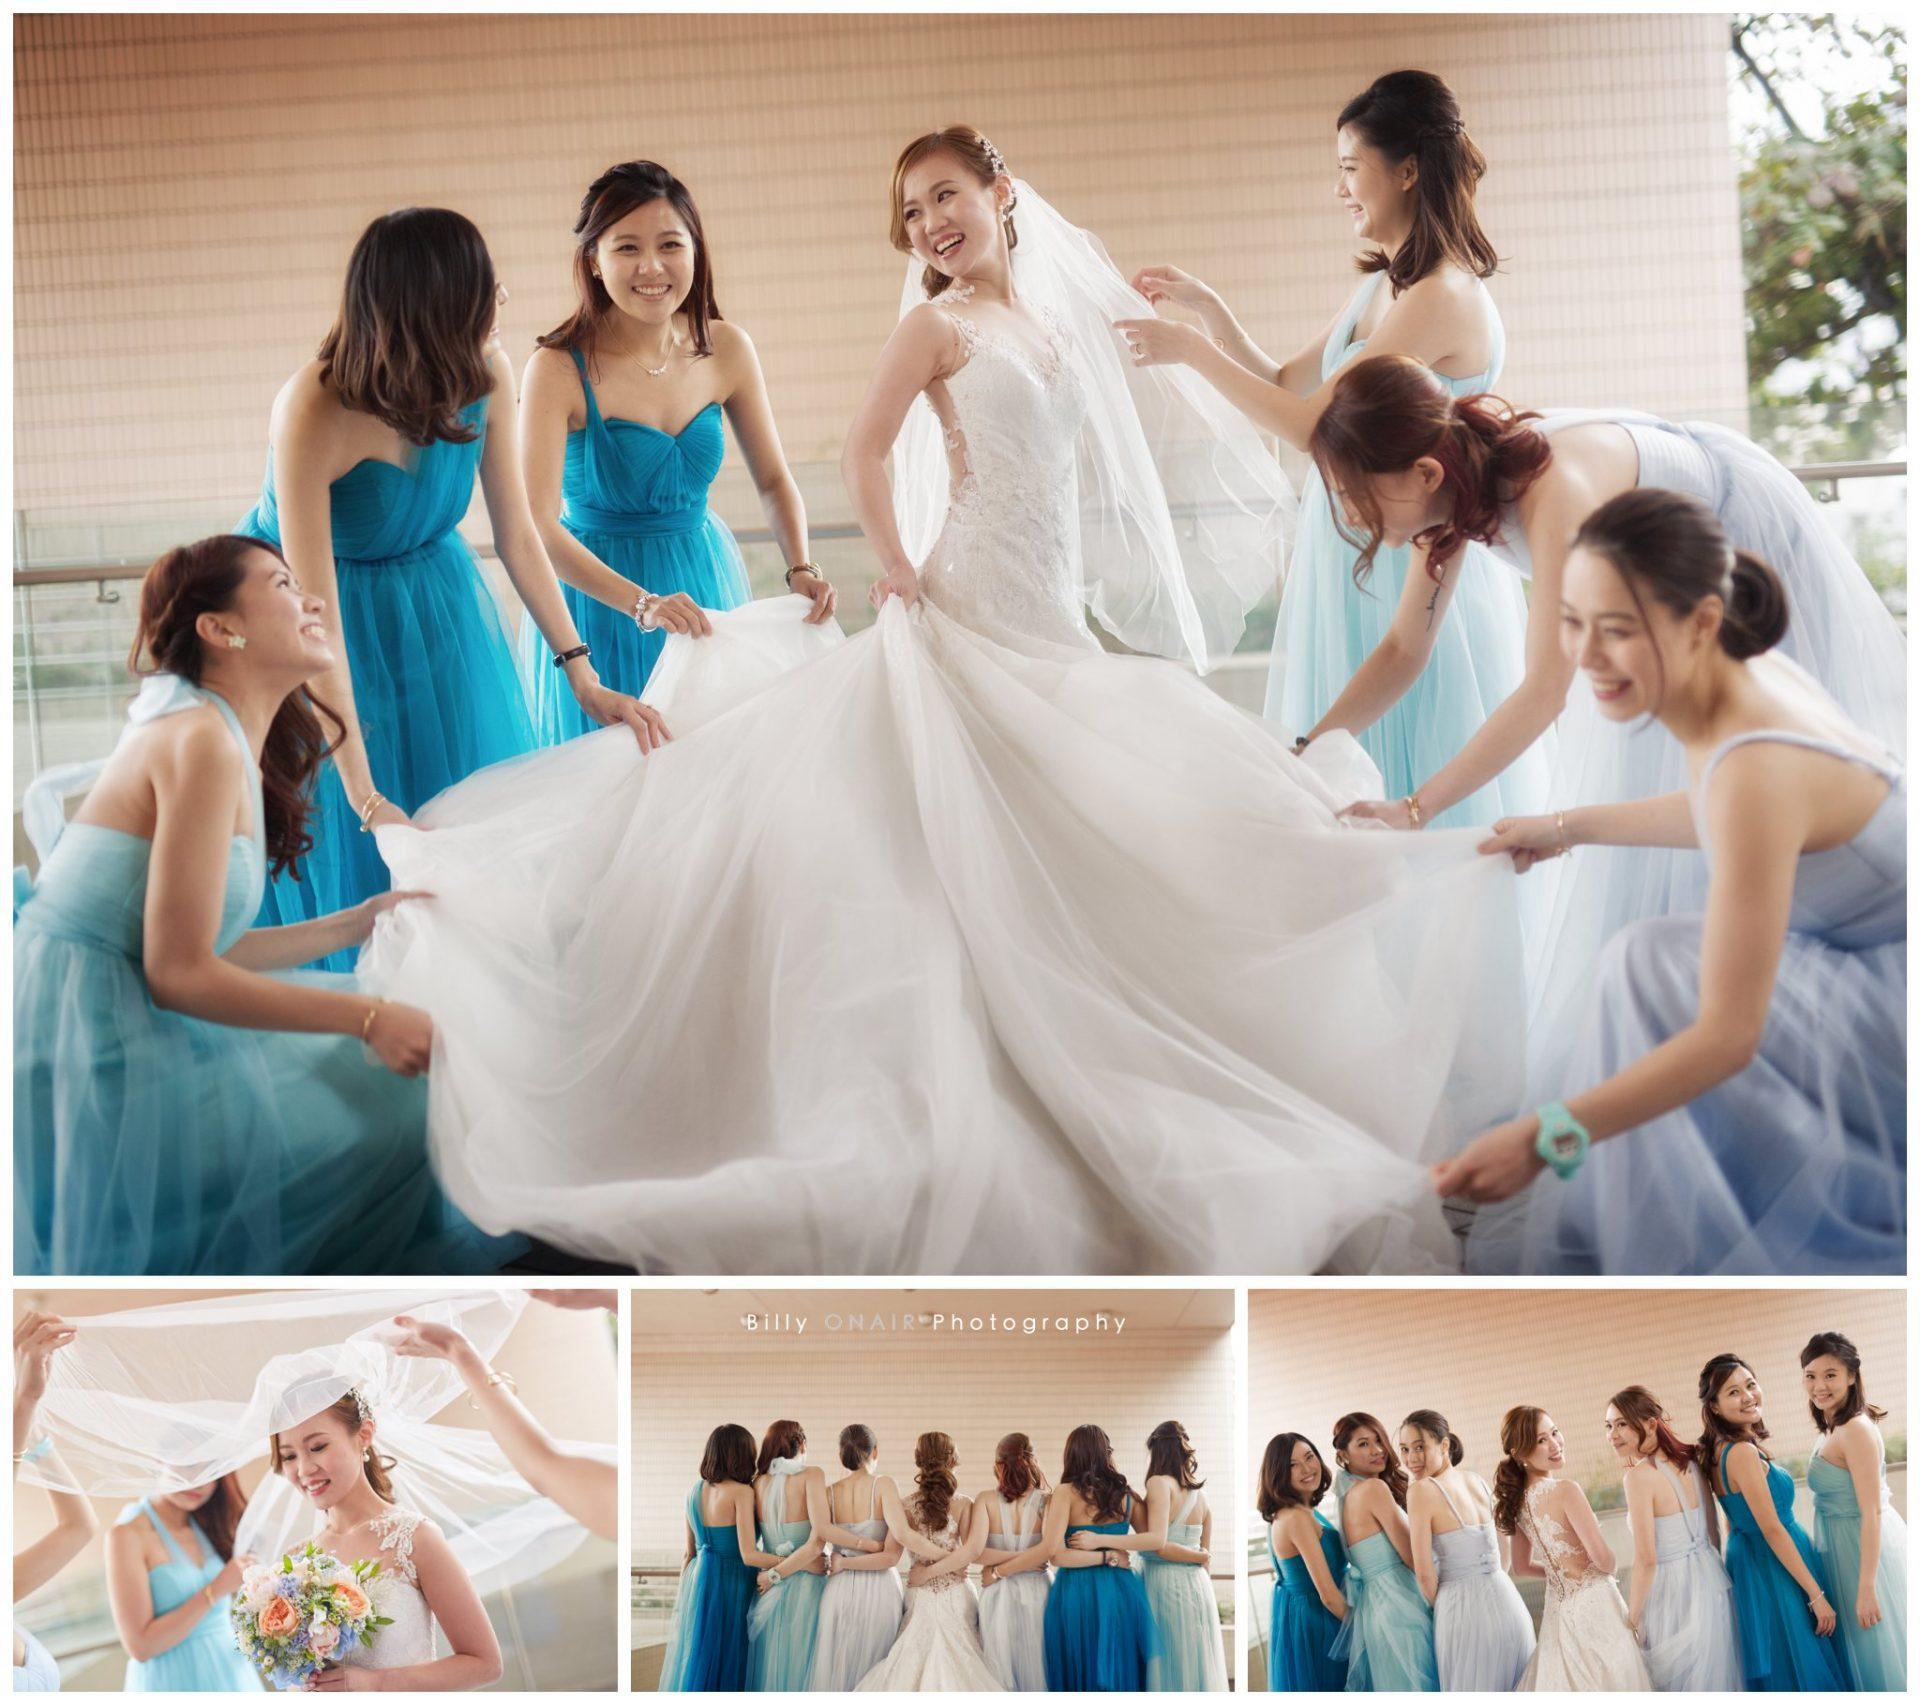 billy_wedding_photography_019